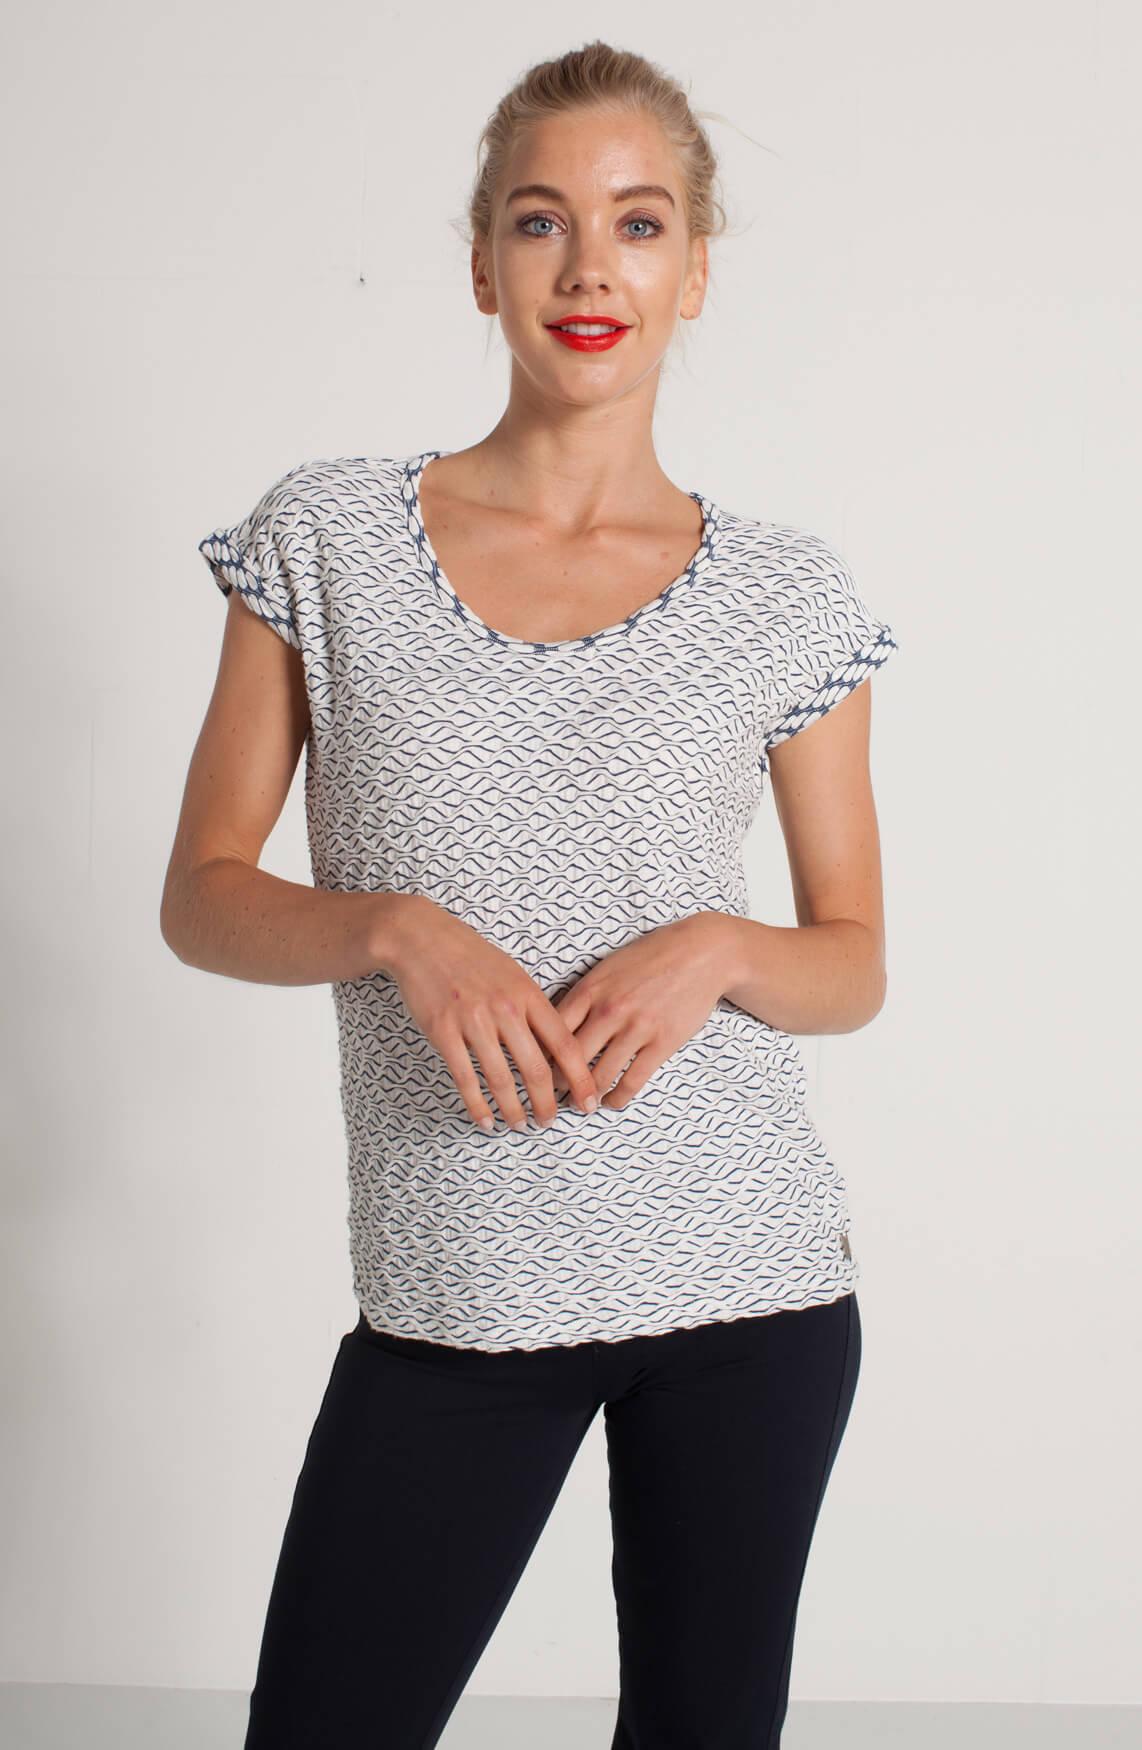 Anna Dames Shirt met reliëfprint wit